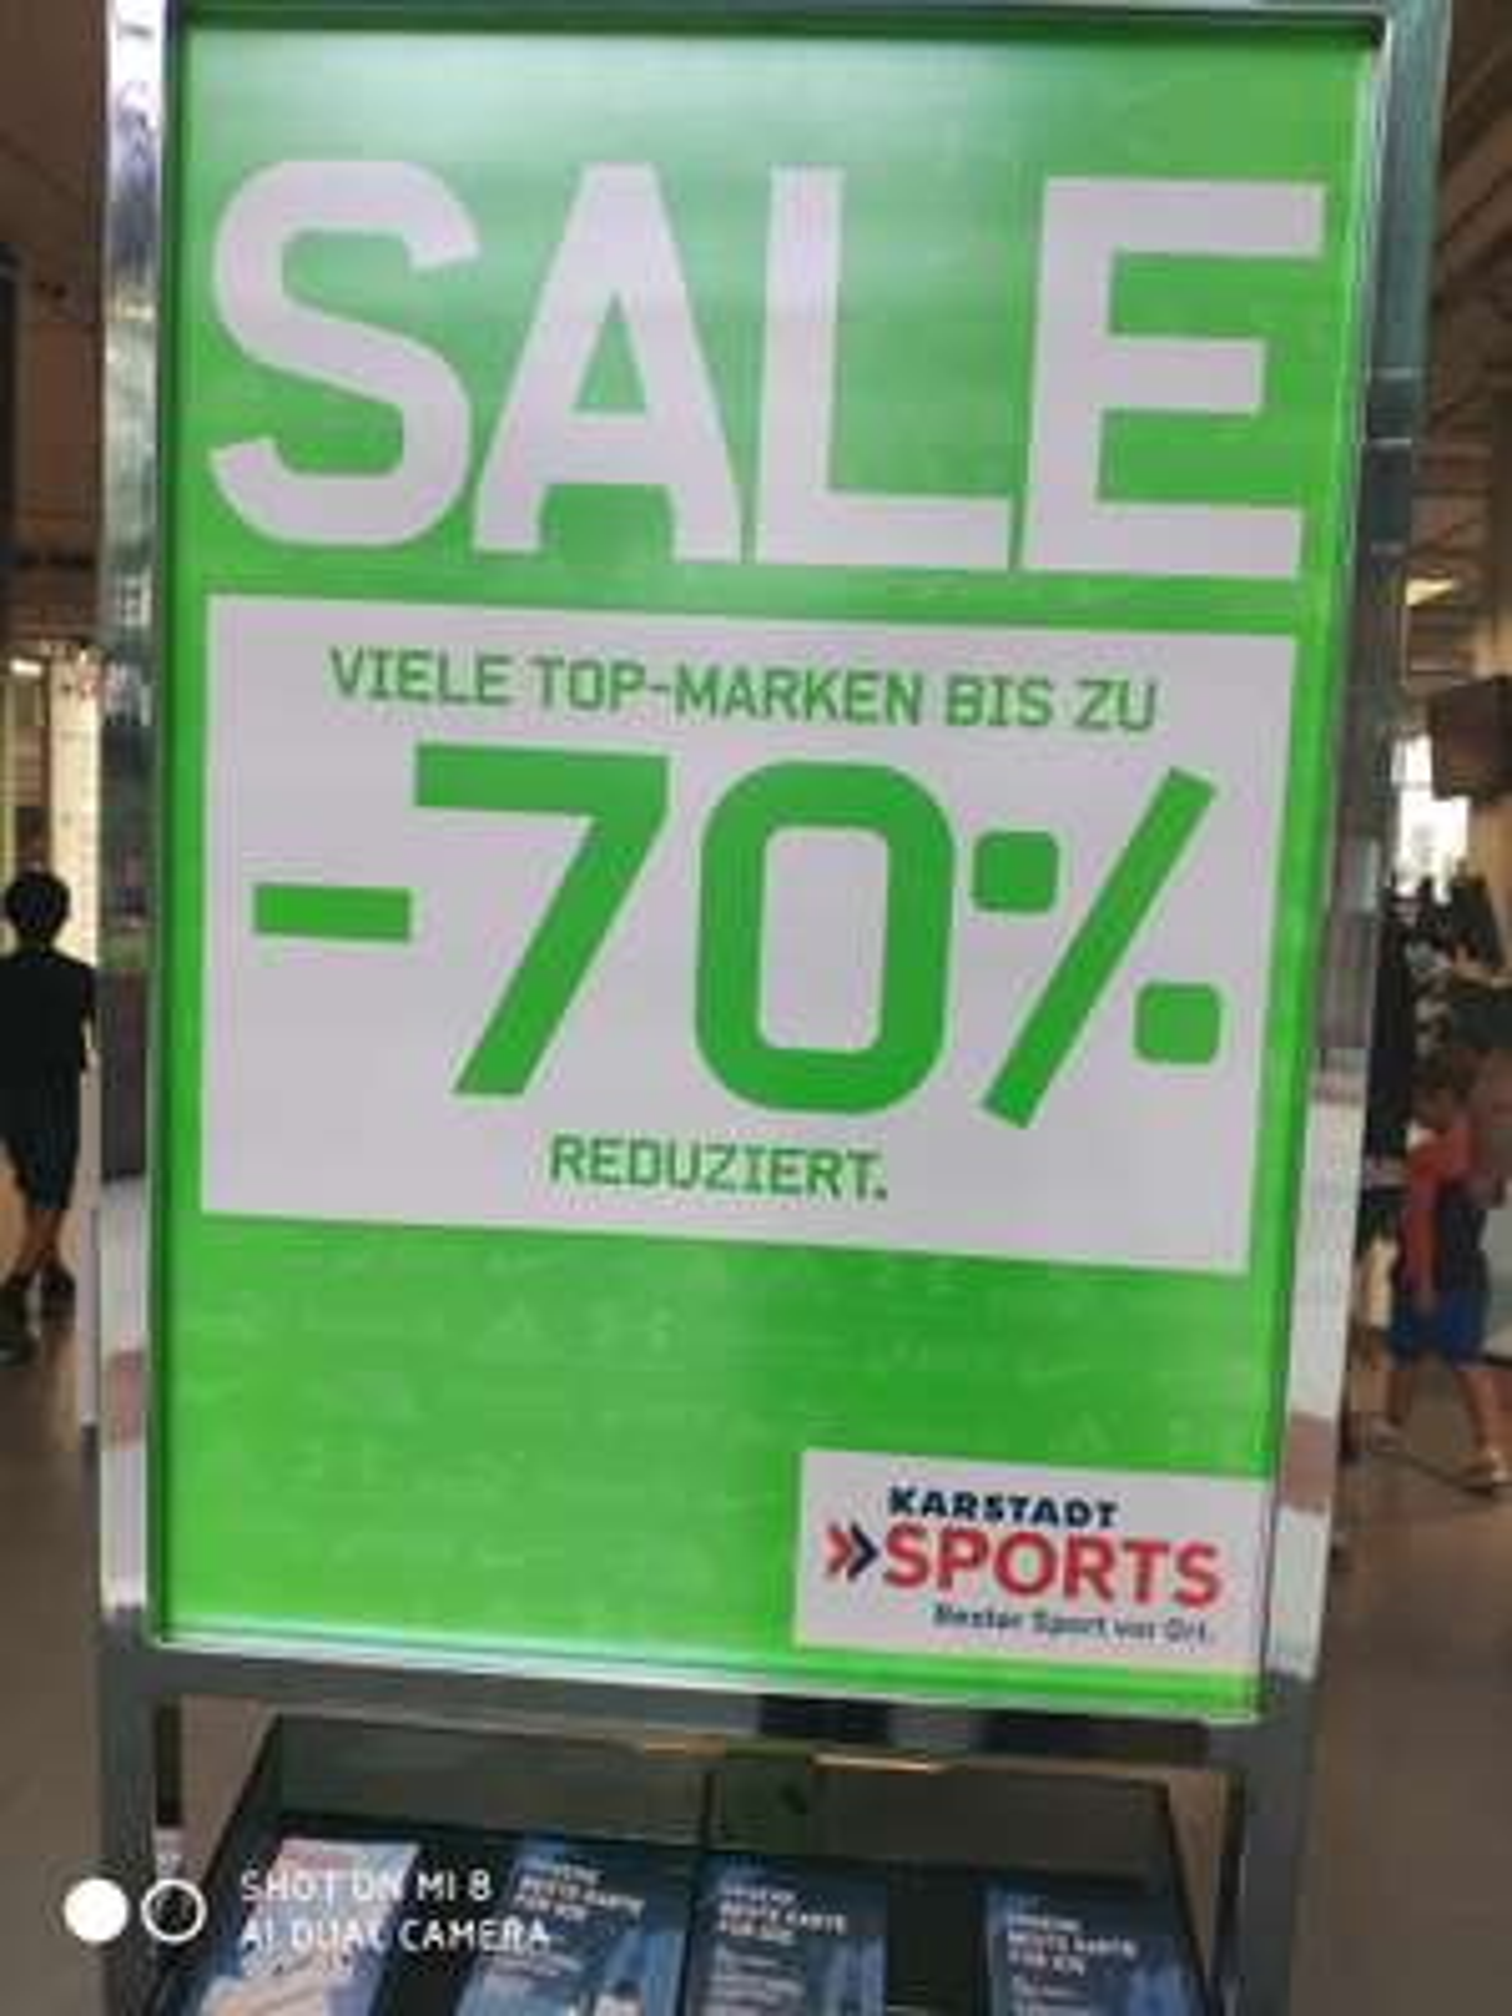 Bis zu 70% bei Karstadt Sports  (Nike, Adidas, Northface, Jack Wolfskin usw.)